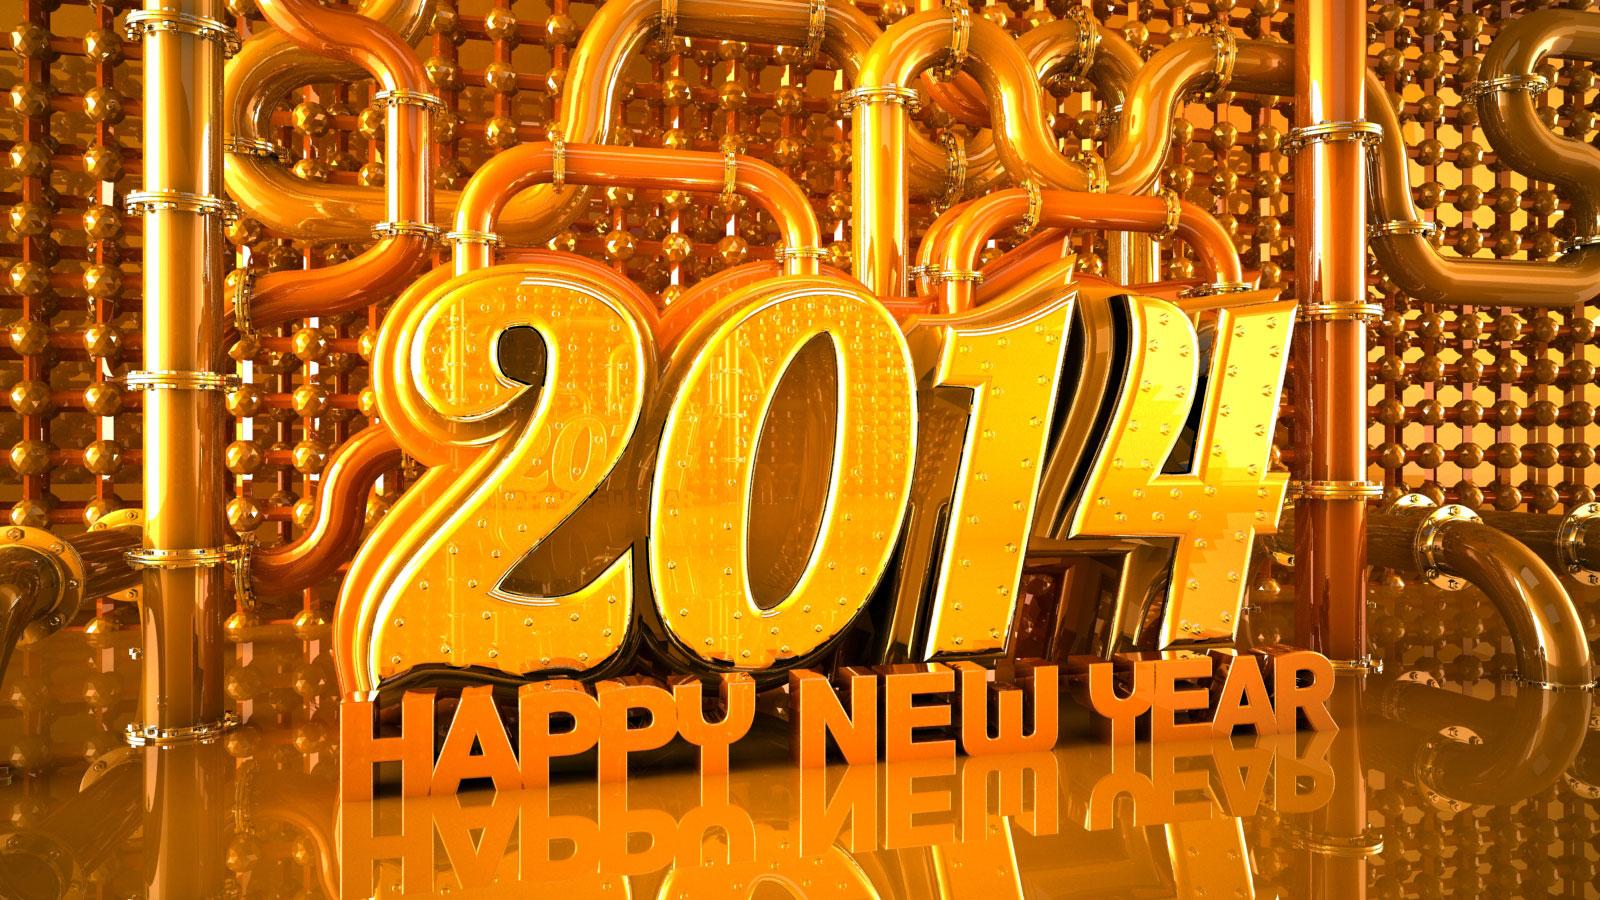 happy new year 2014 desktop background